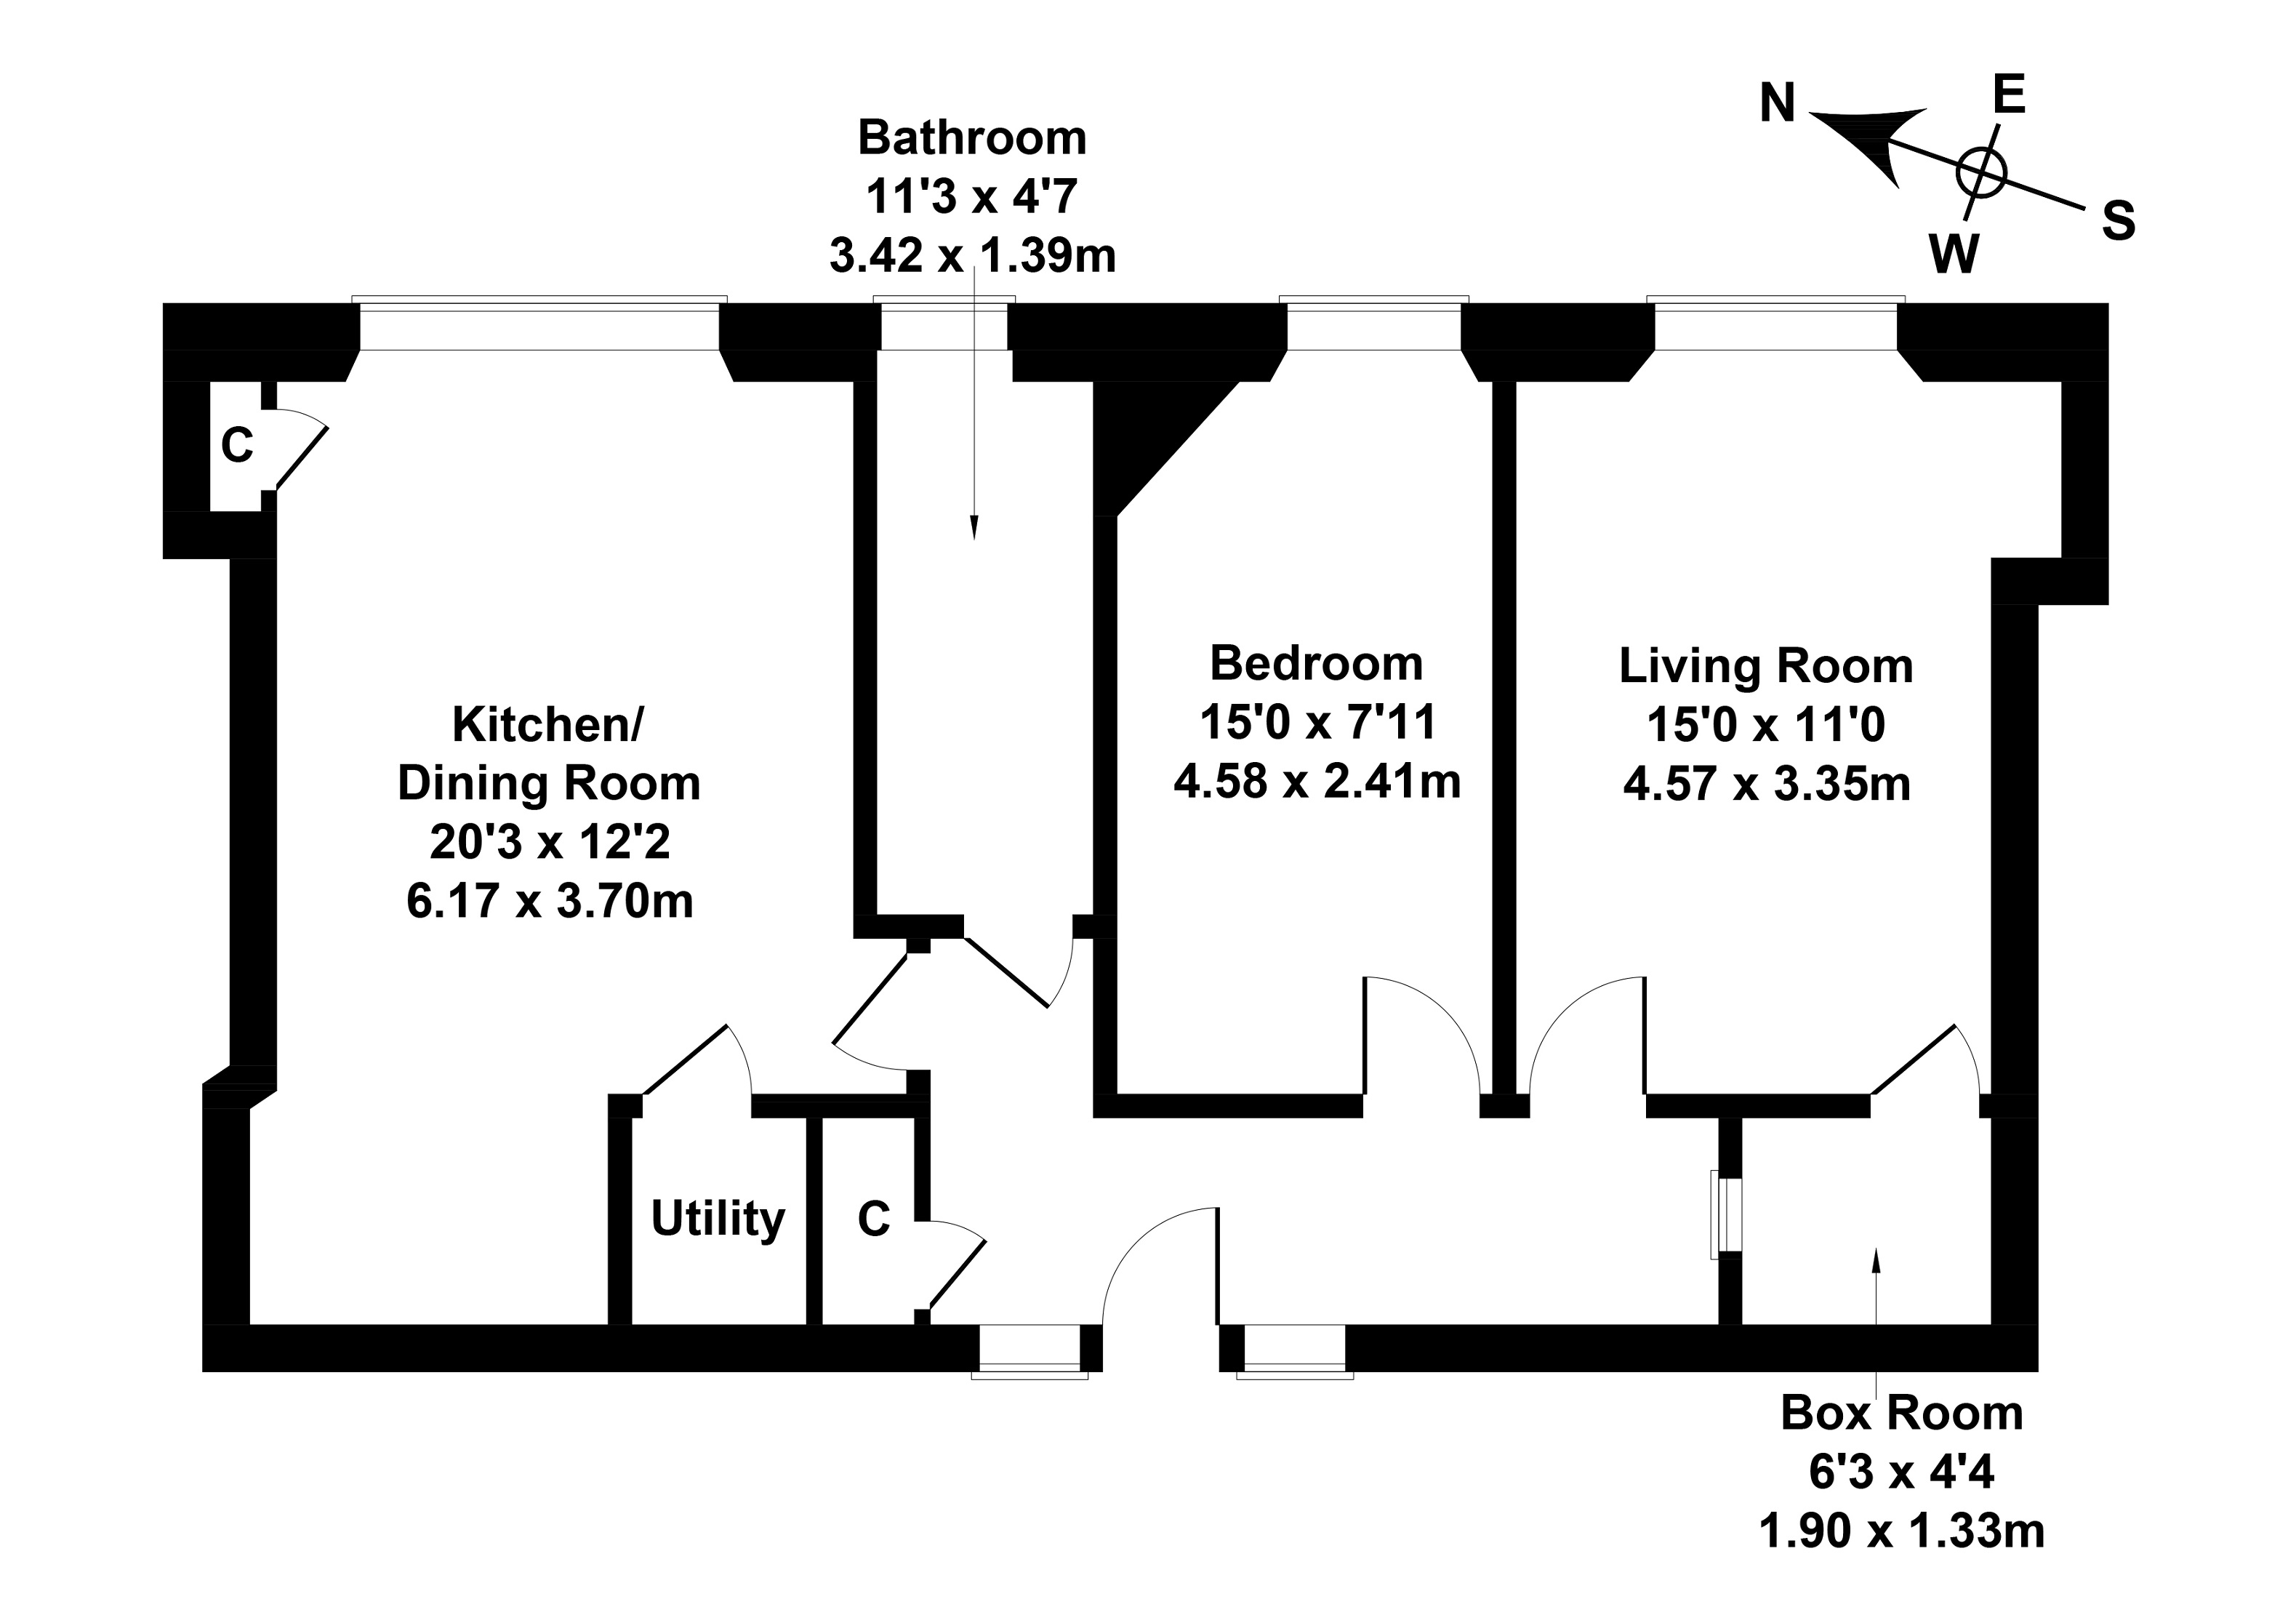 Floorplan 1 of 8/8, Comely Bank Street, Comely Bank, Edinburgh, EH4 1BD